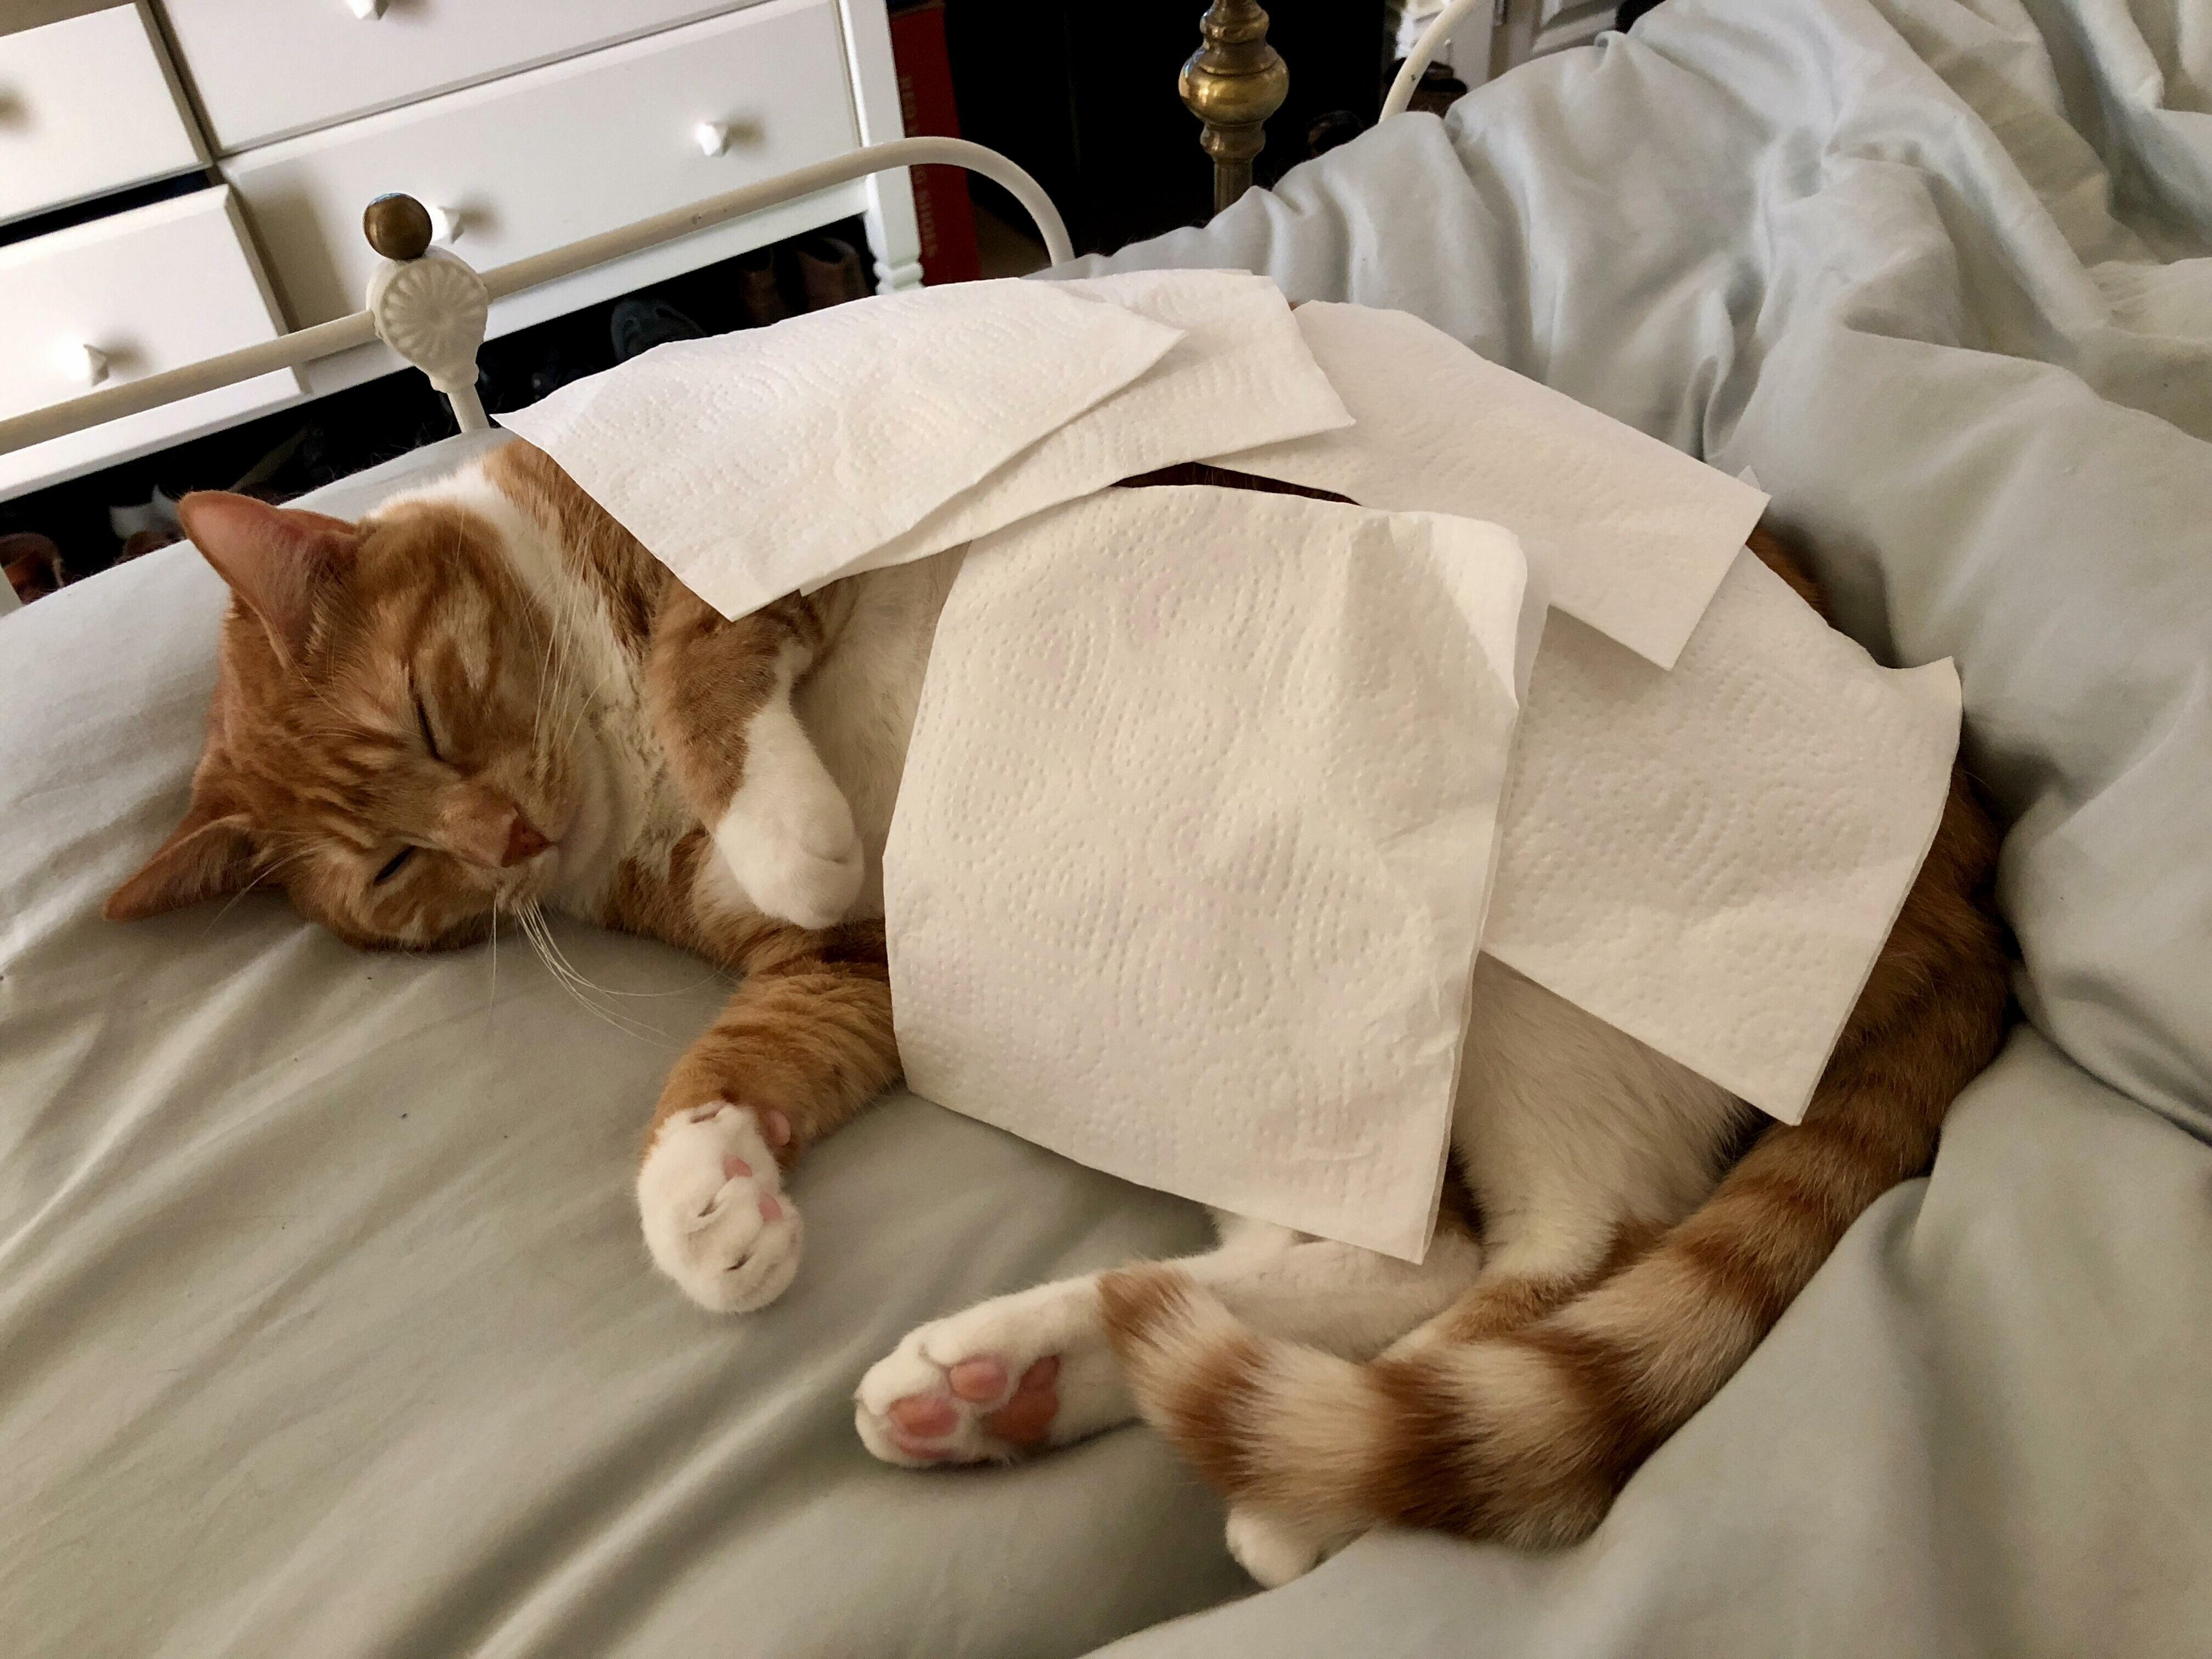 Little napkin nap